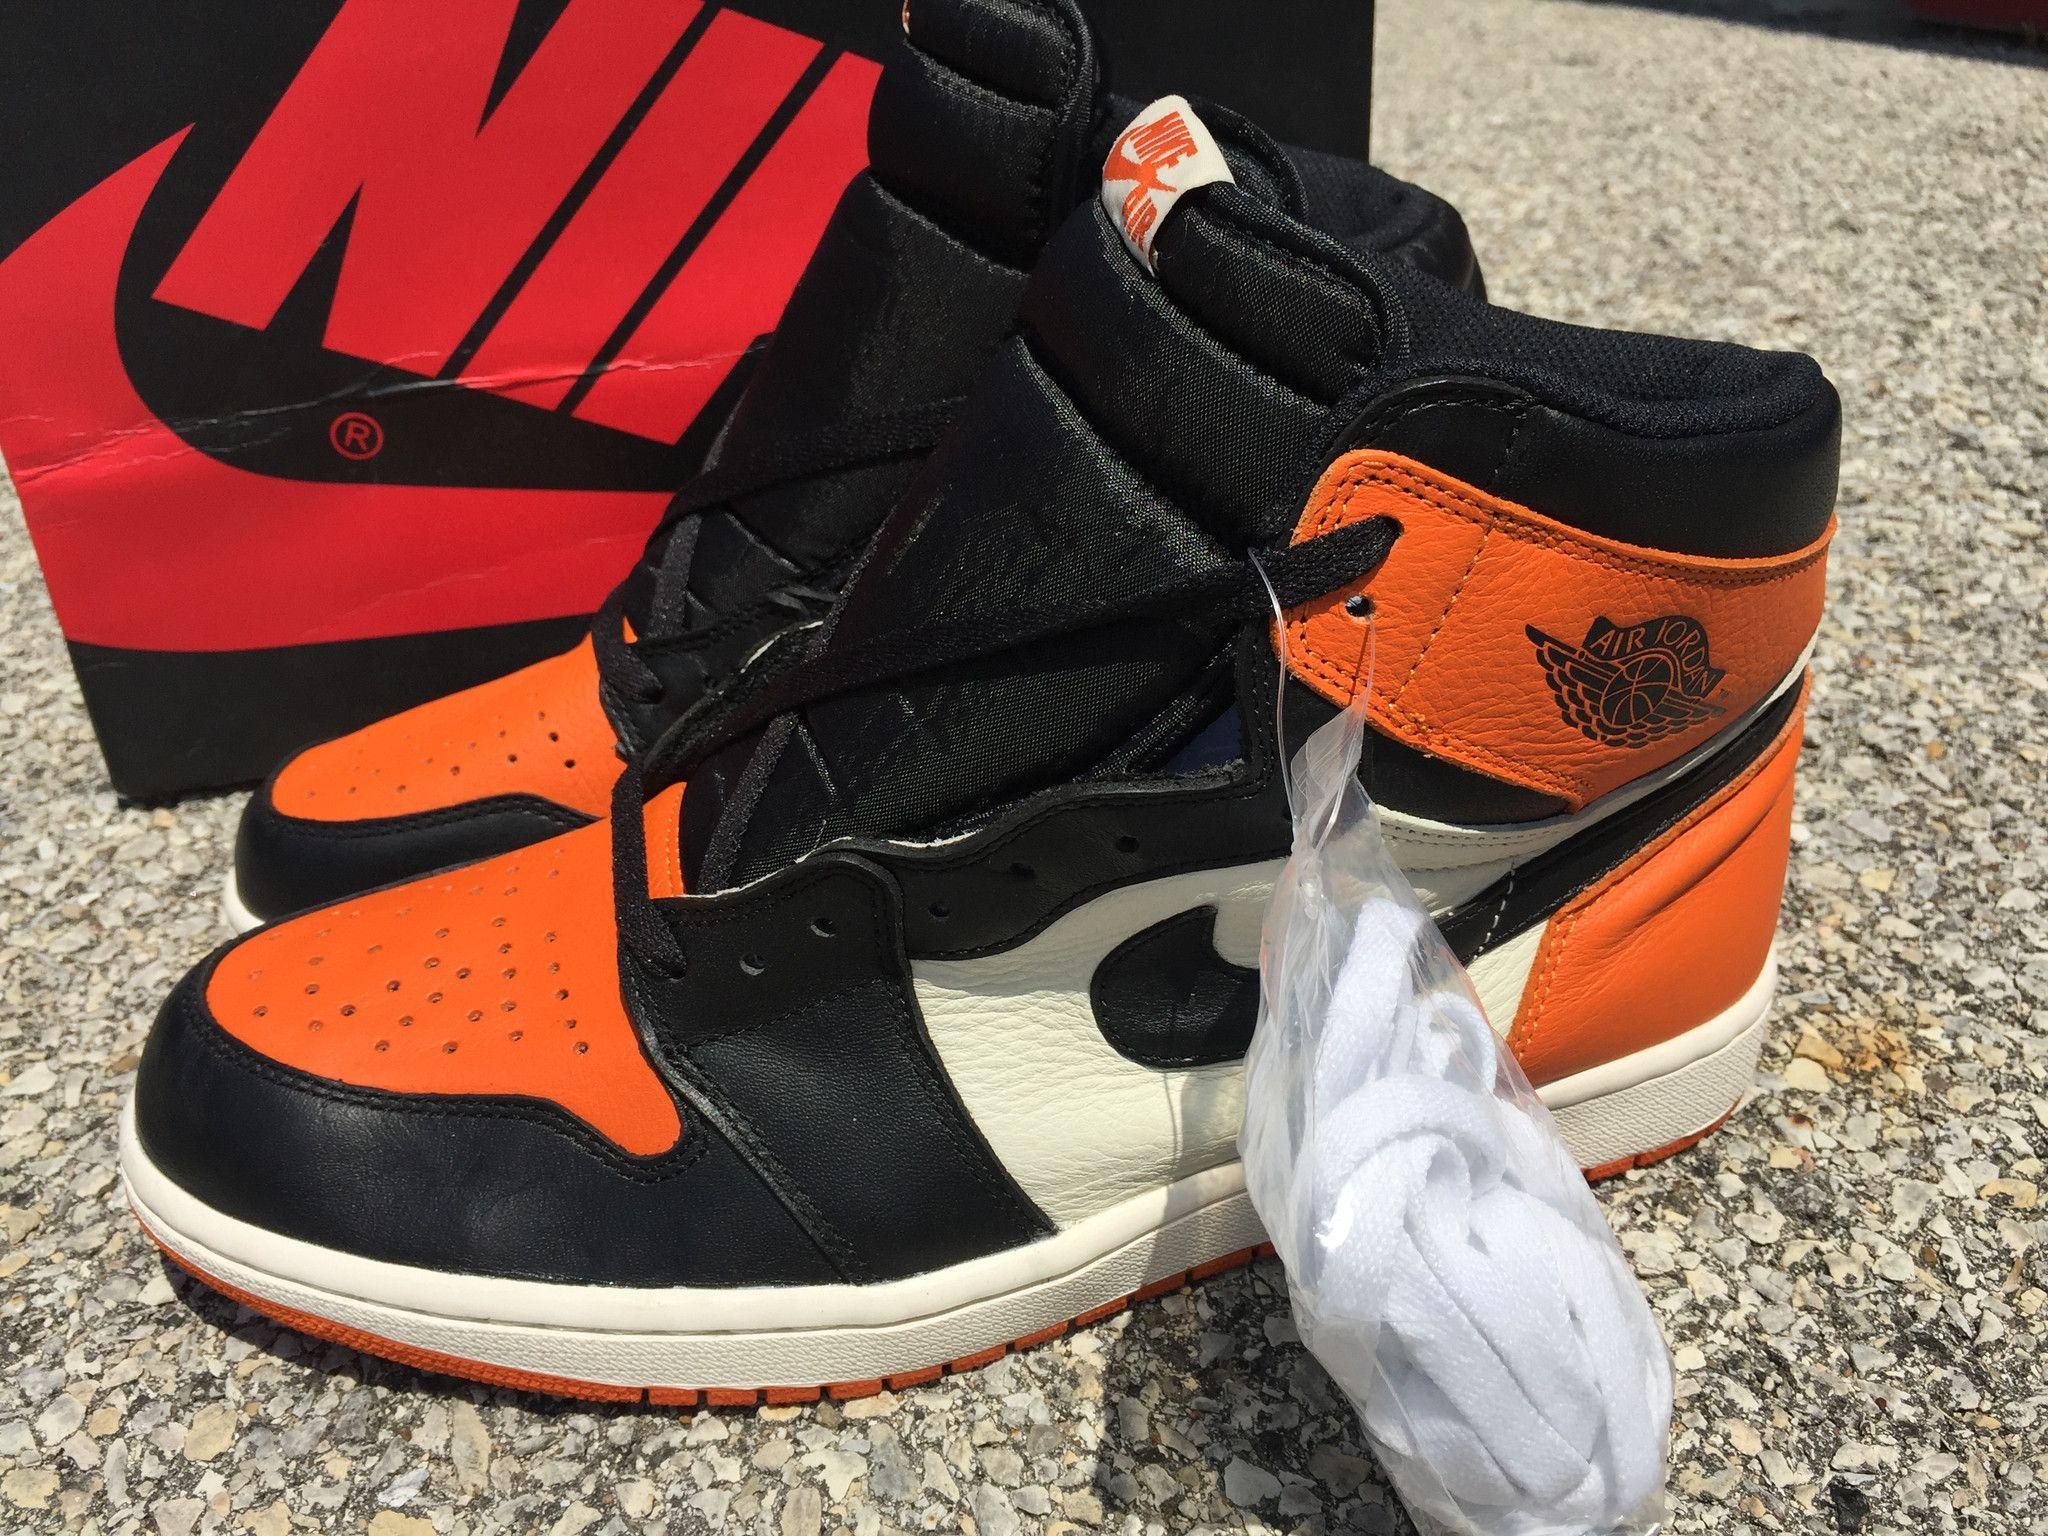 6a8dc8327f7 Nike Air Jordan Retro 1